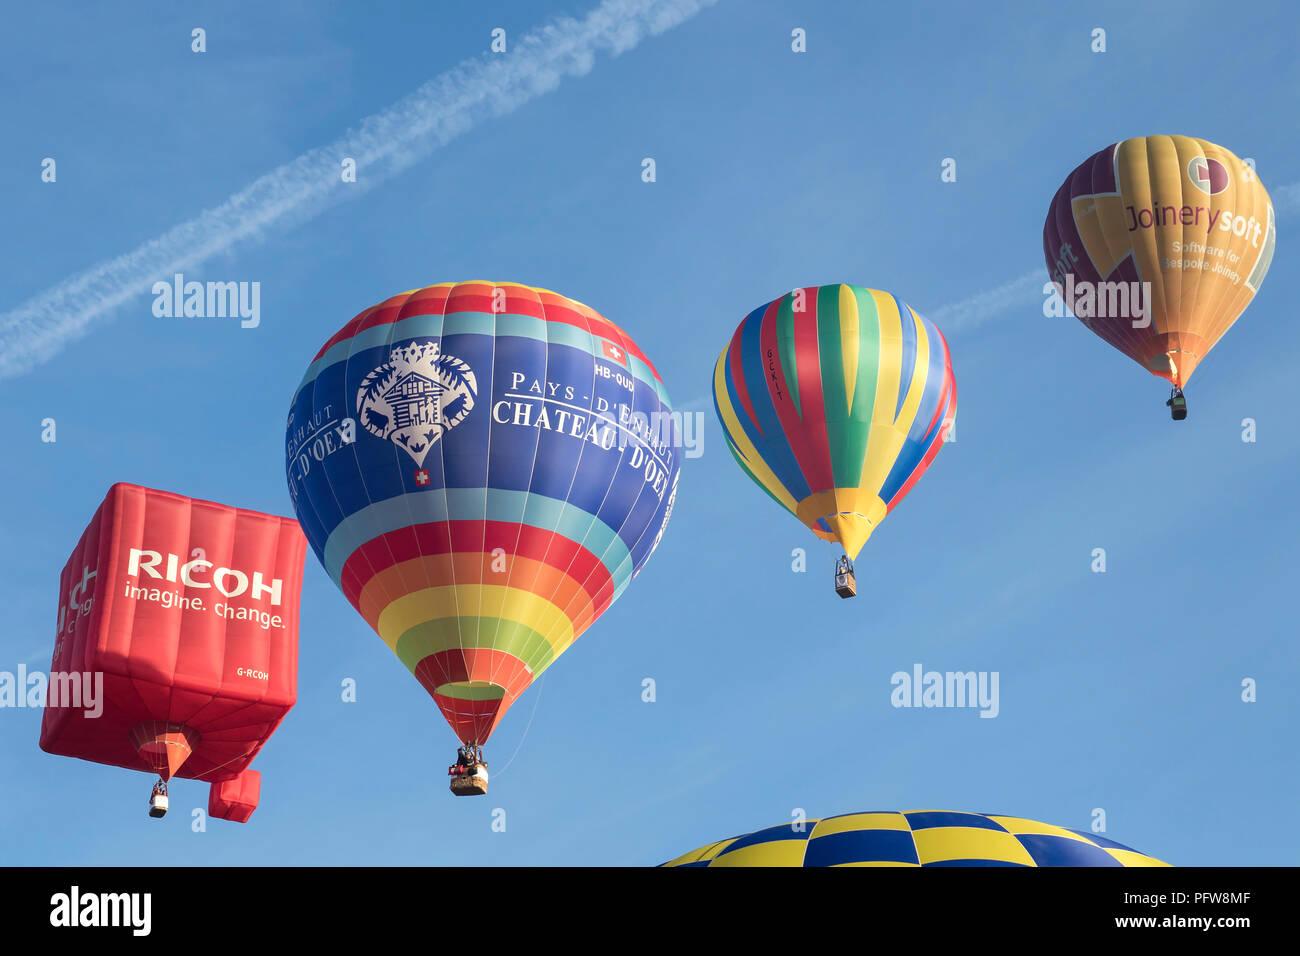 Bristol International Balloon Fiesta 2018 at Ashton Court Estate, Bristol England Stock Photo